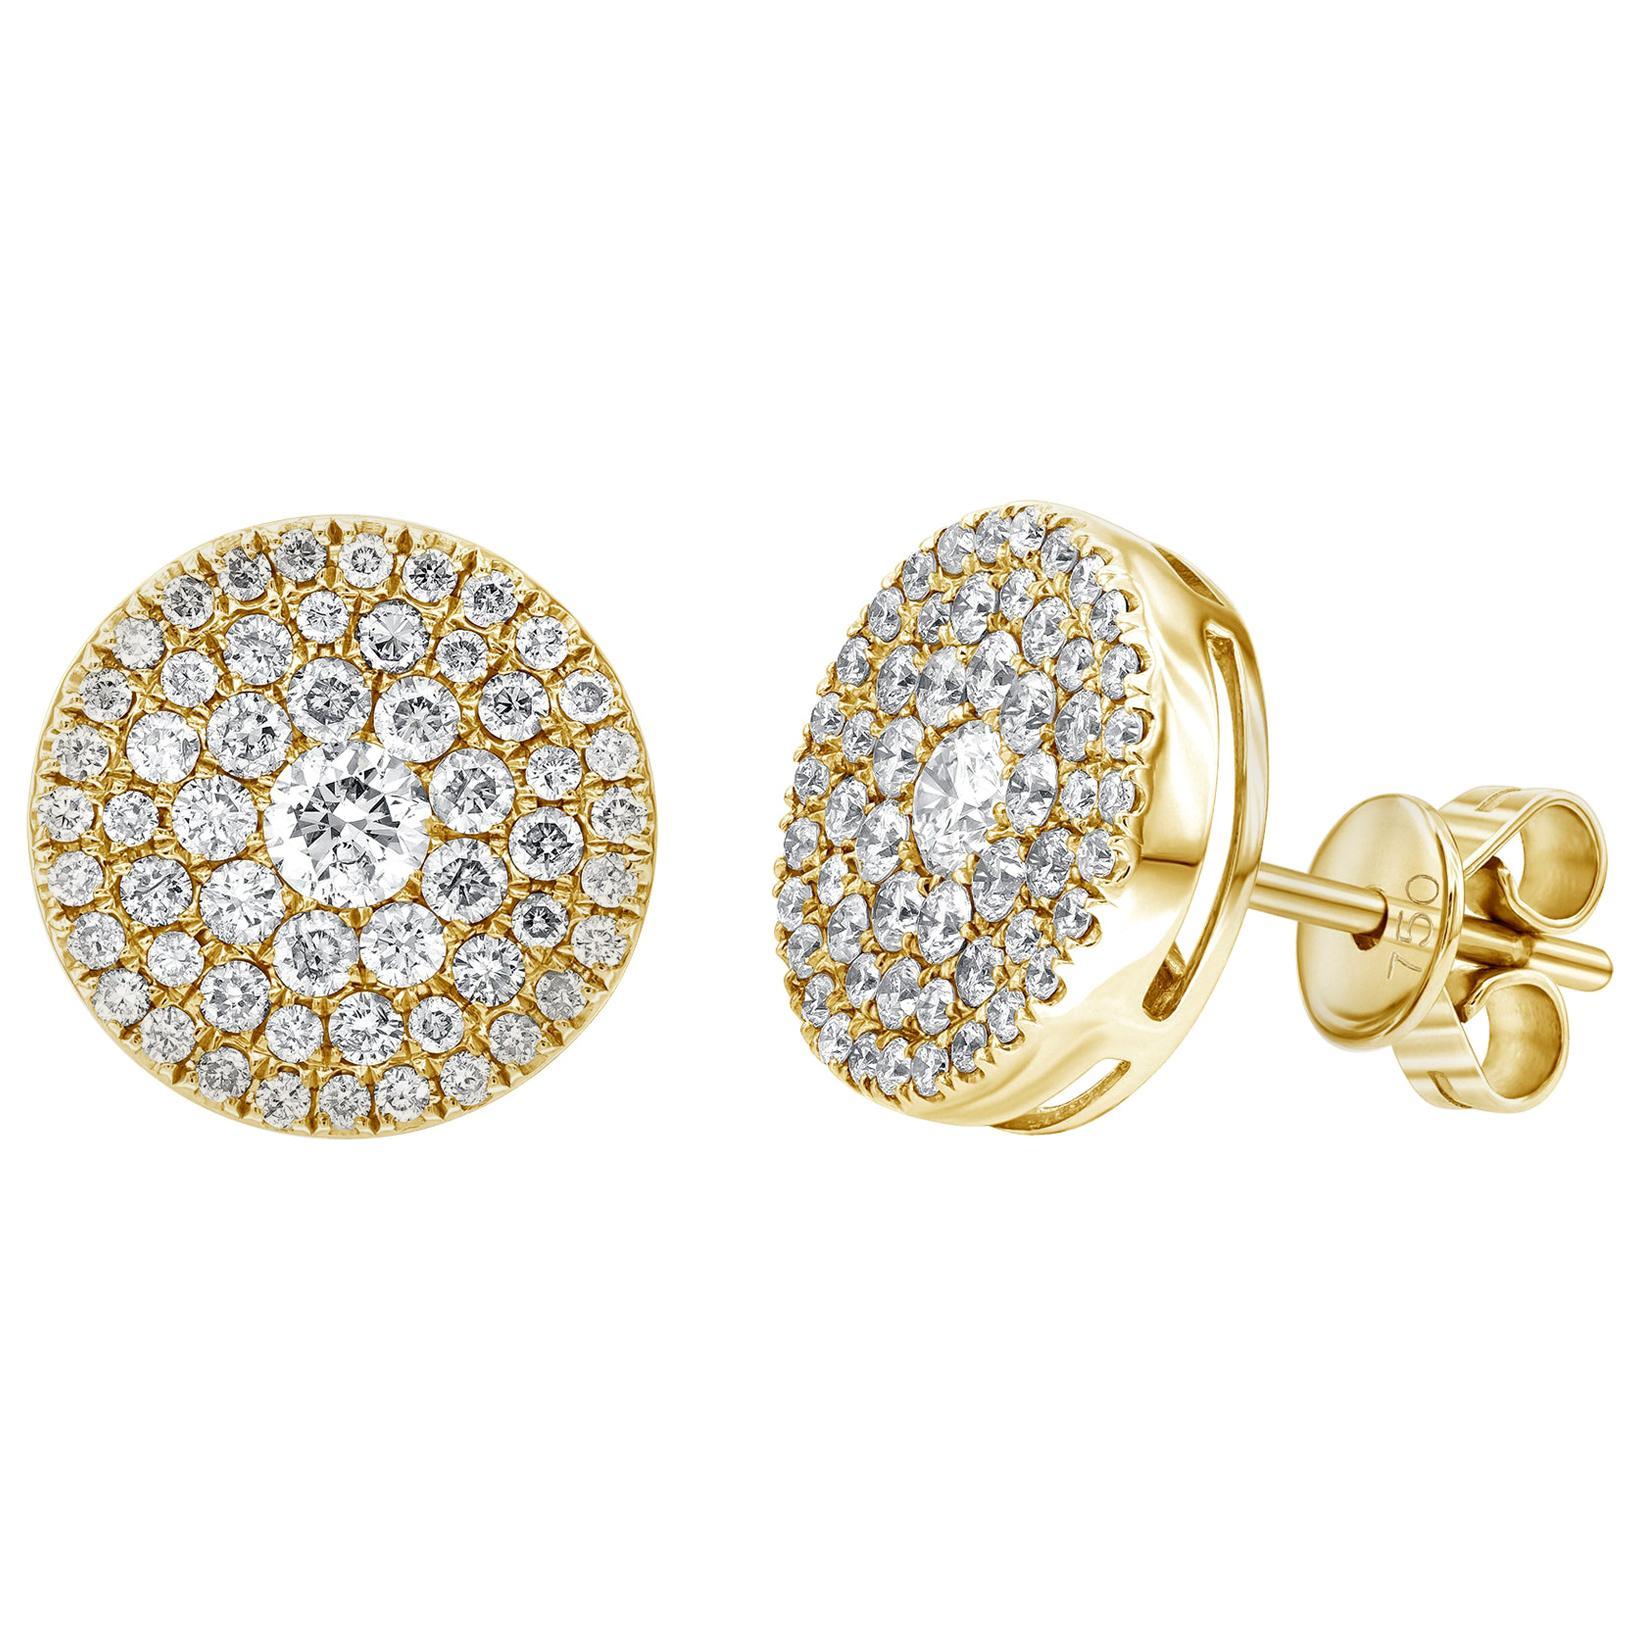 0.75 Carat Pave Set Cluster Round White Diamond 18 Karat Gold Stud Earrings